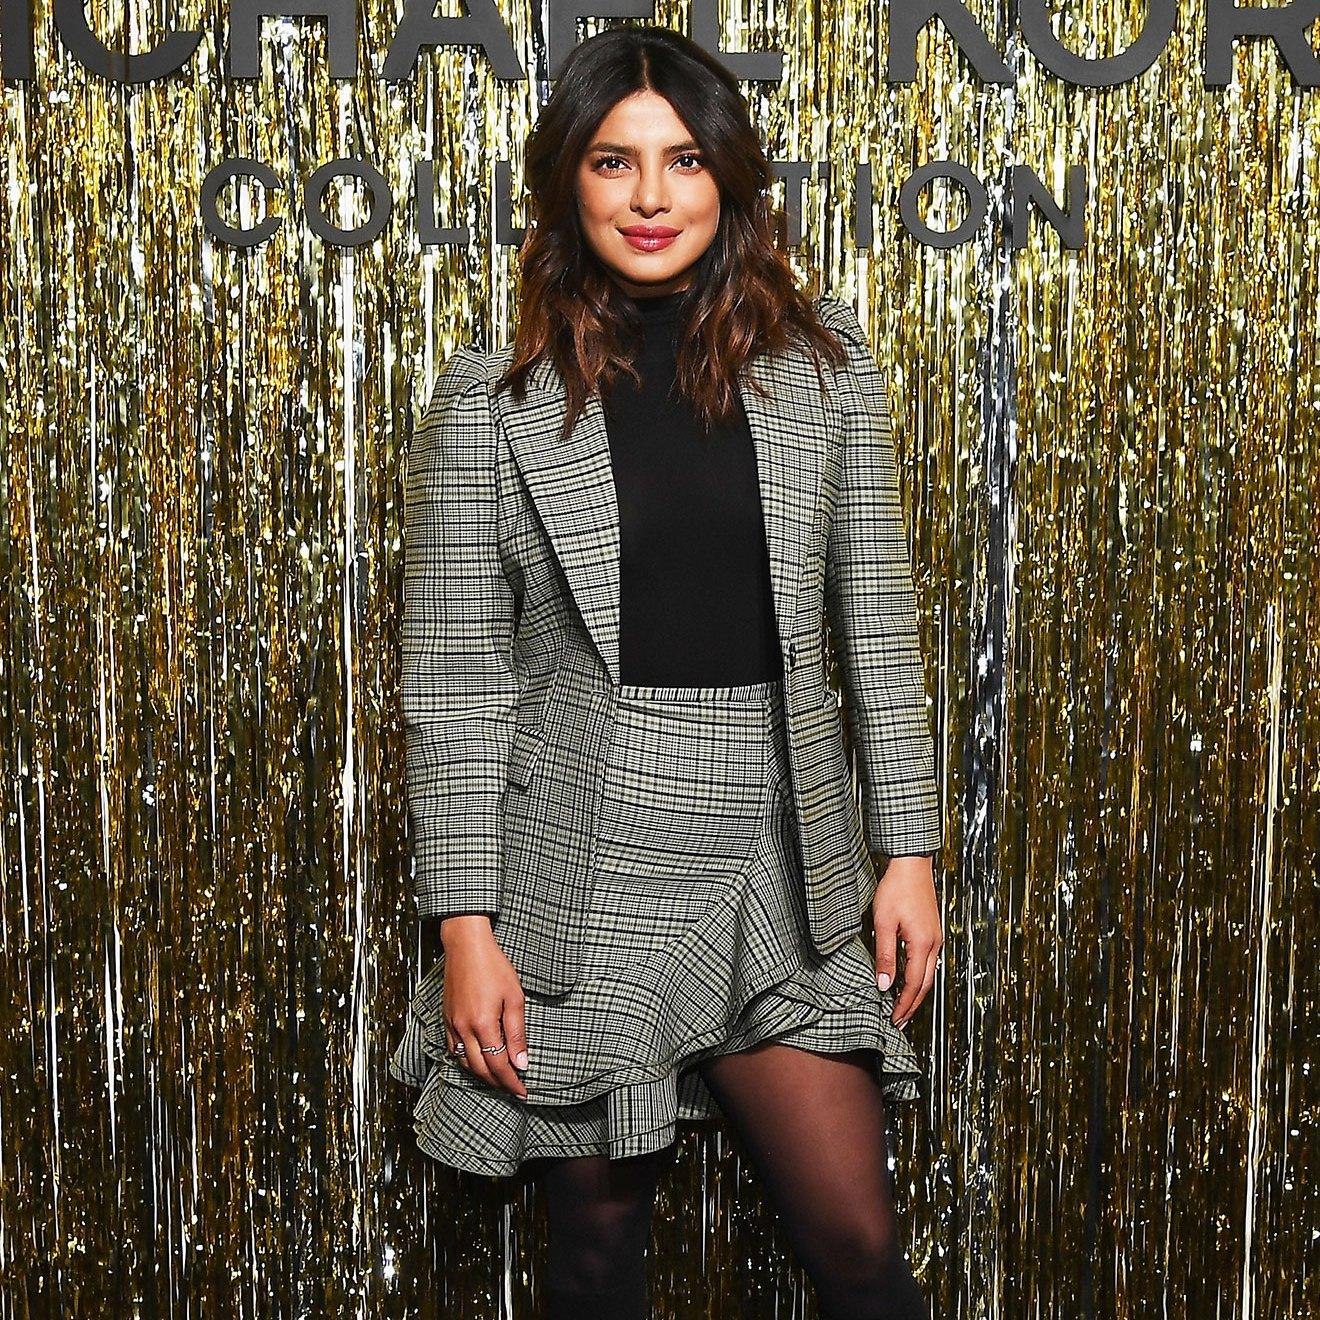 Priyanka Chopra Michael Kors Collection Fall 2019 Runway Show about last night